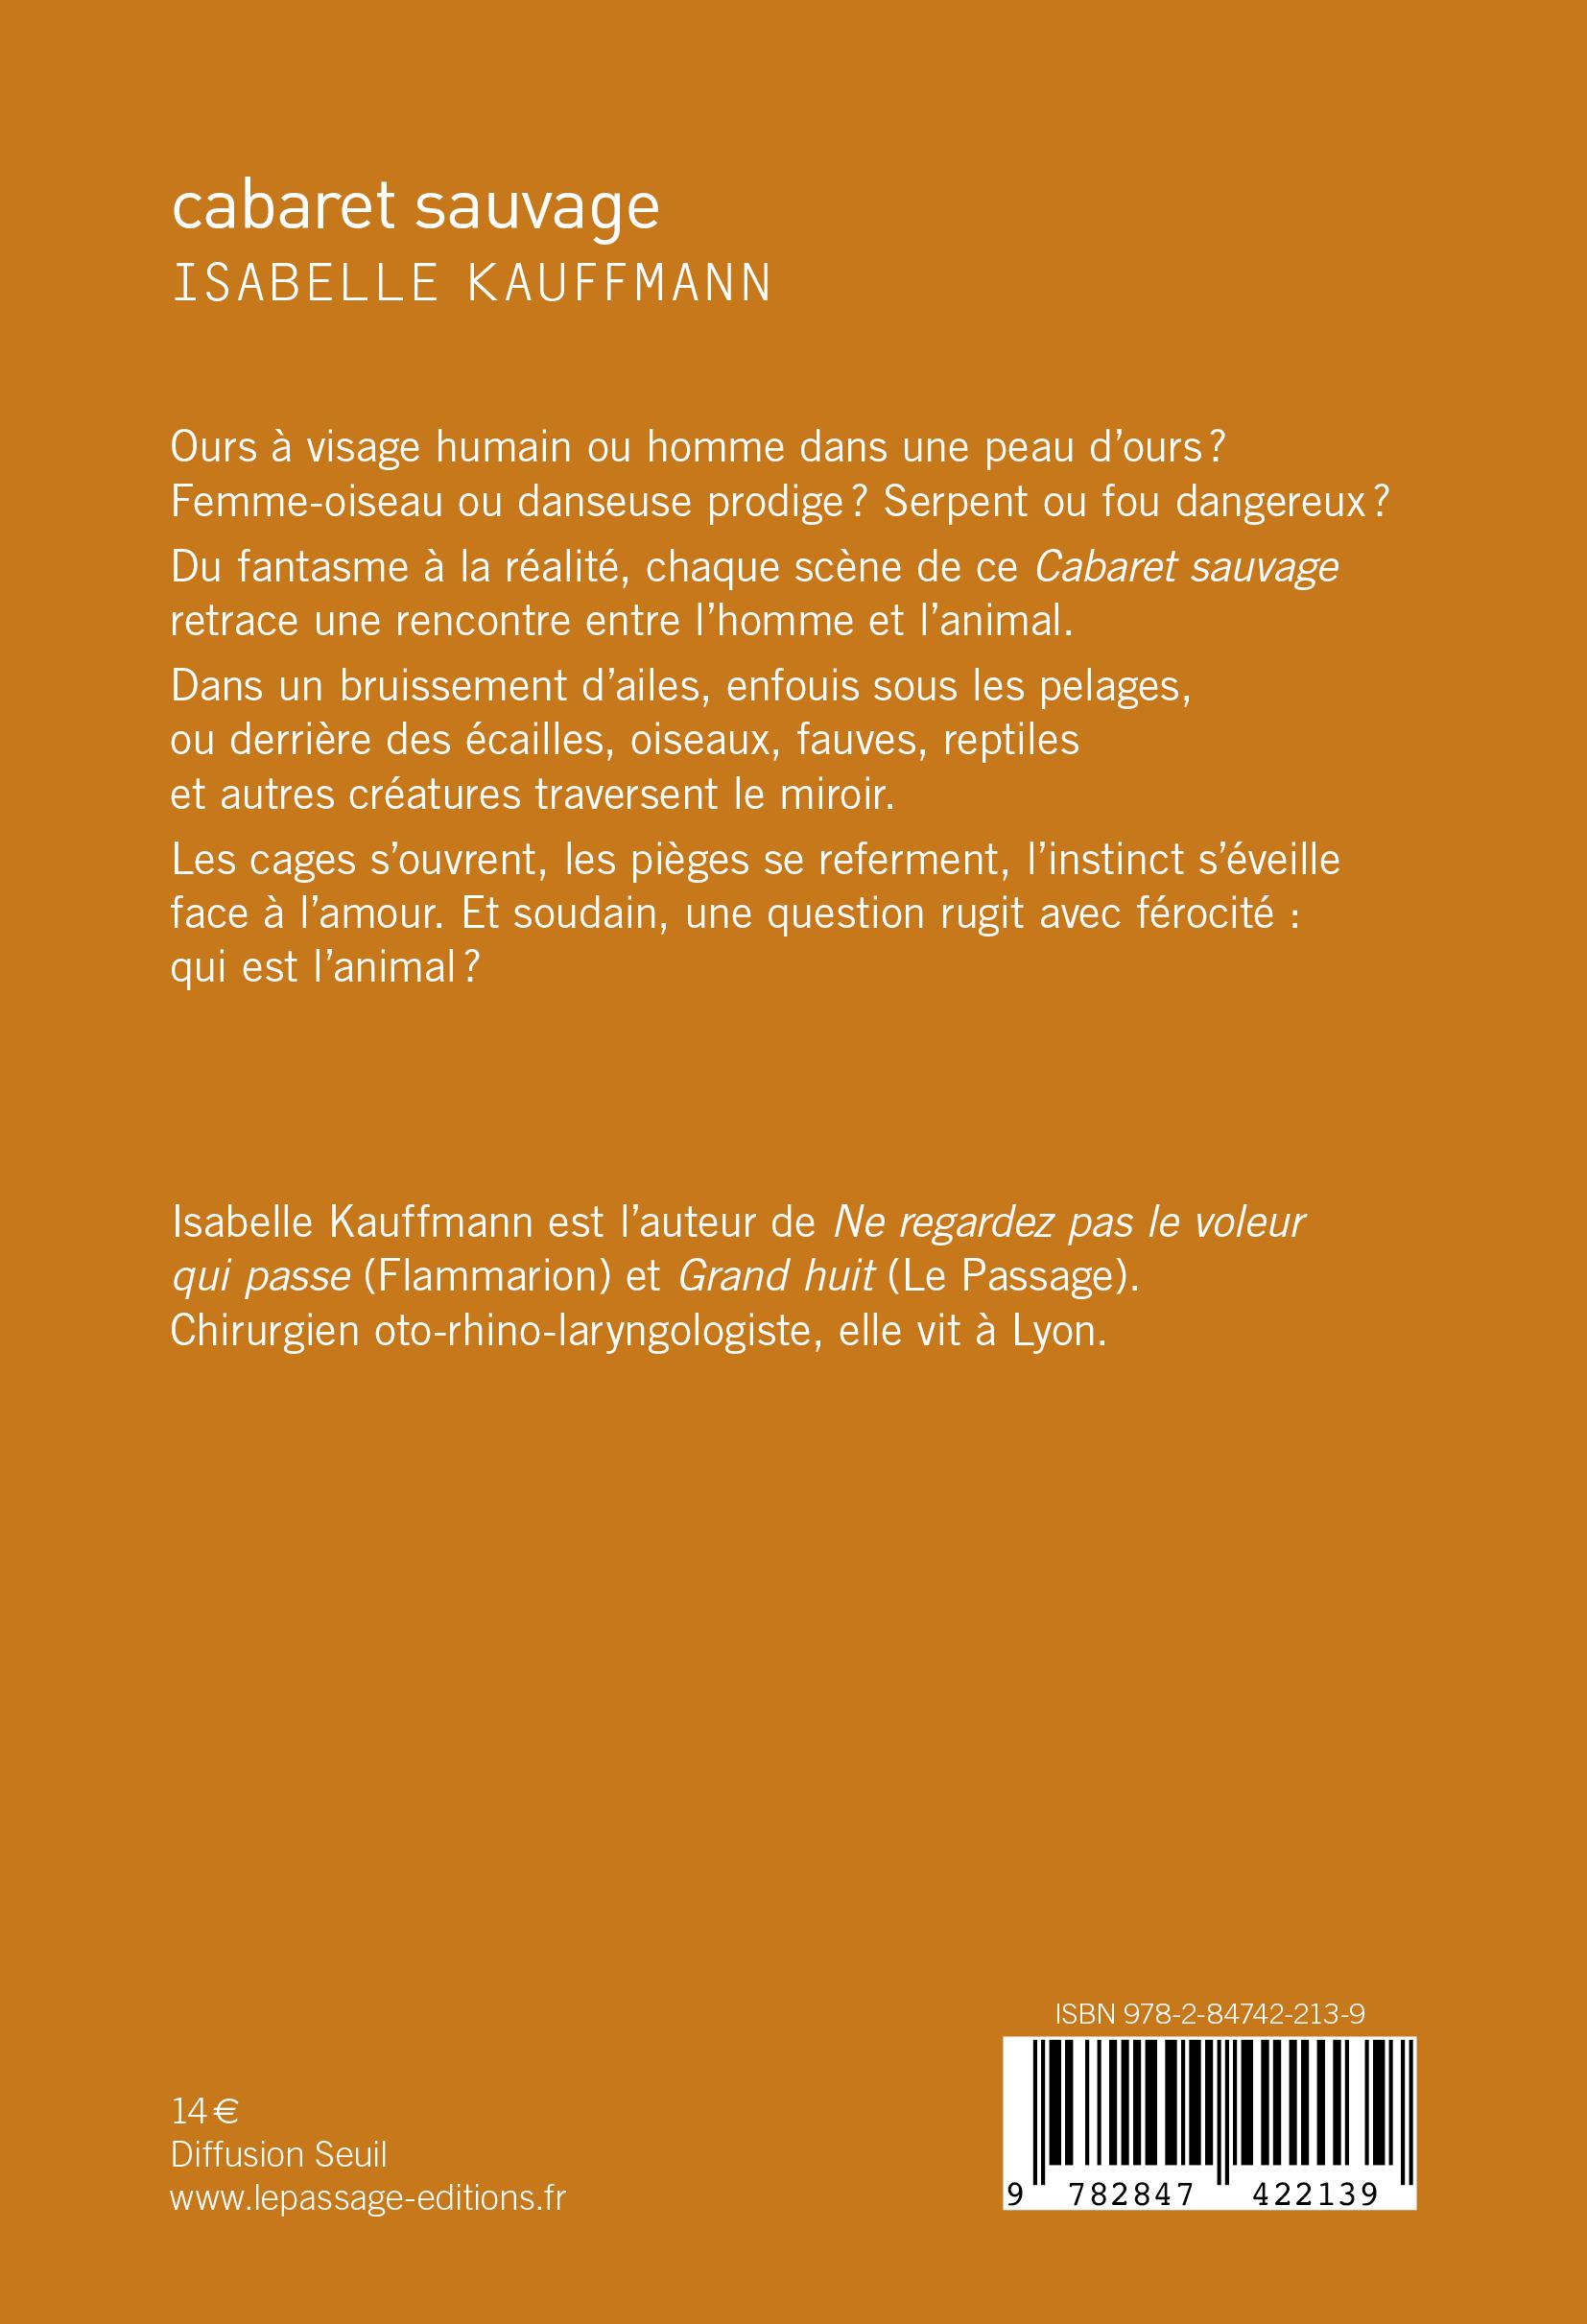 Cabaret_sauvage-4e